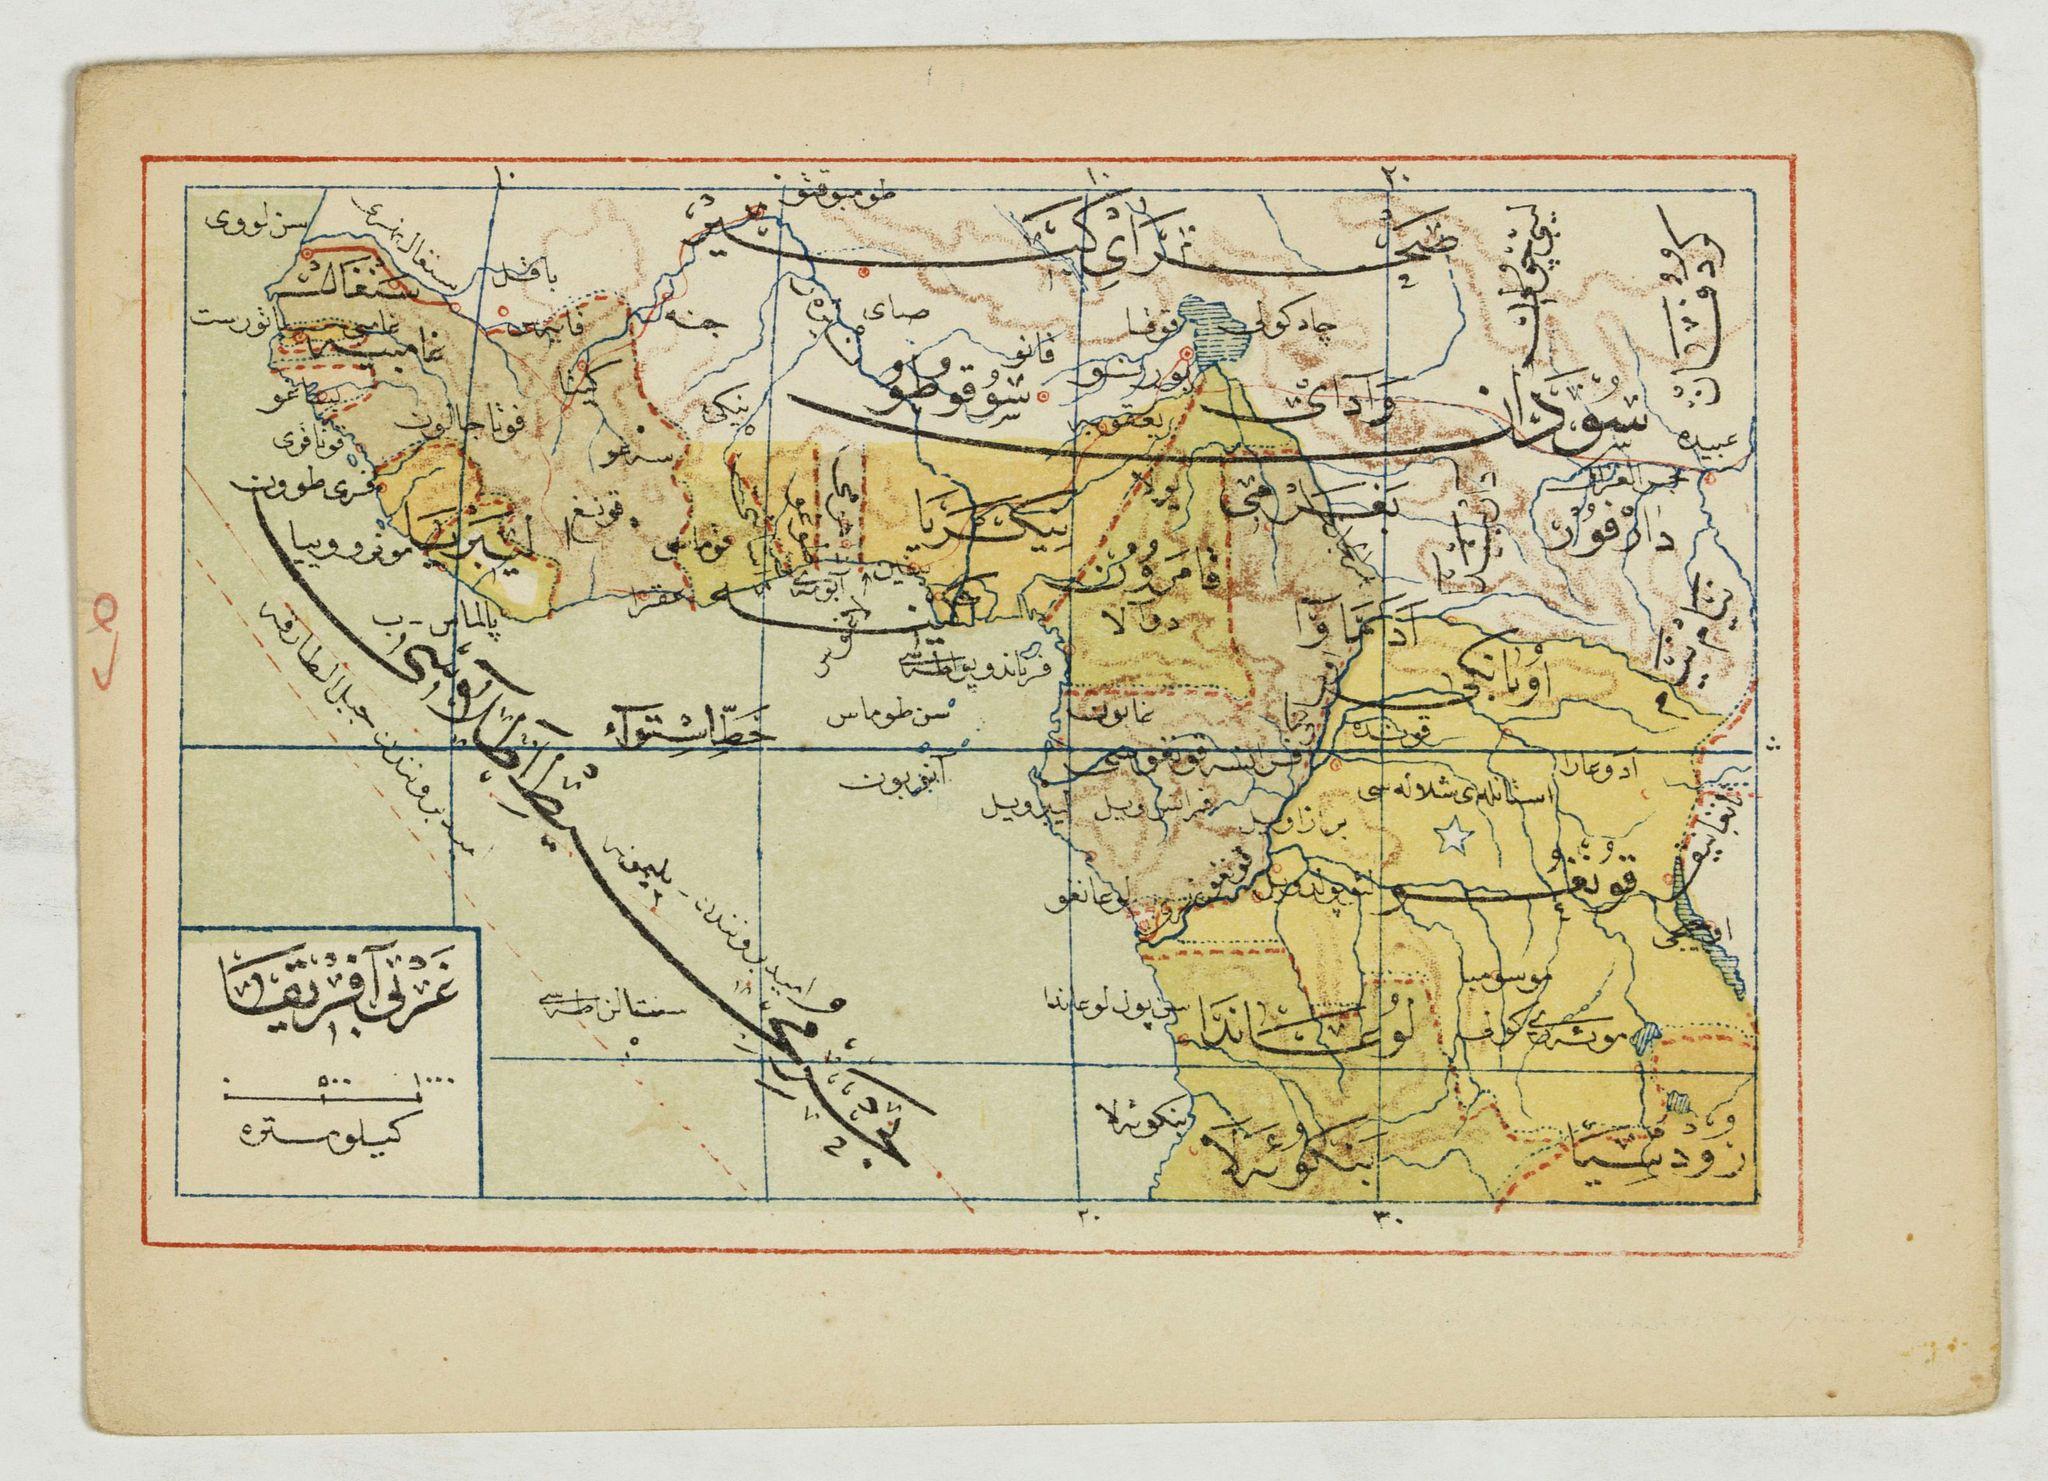 ESREF, Mehmet -  [Equatorial Africa - map with Ottoman script]